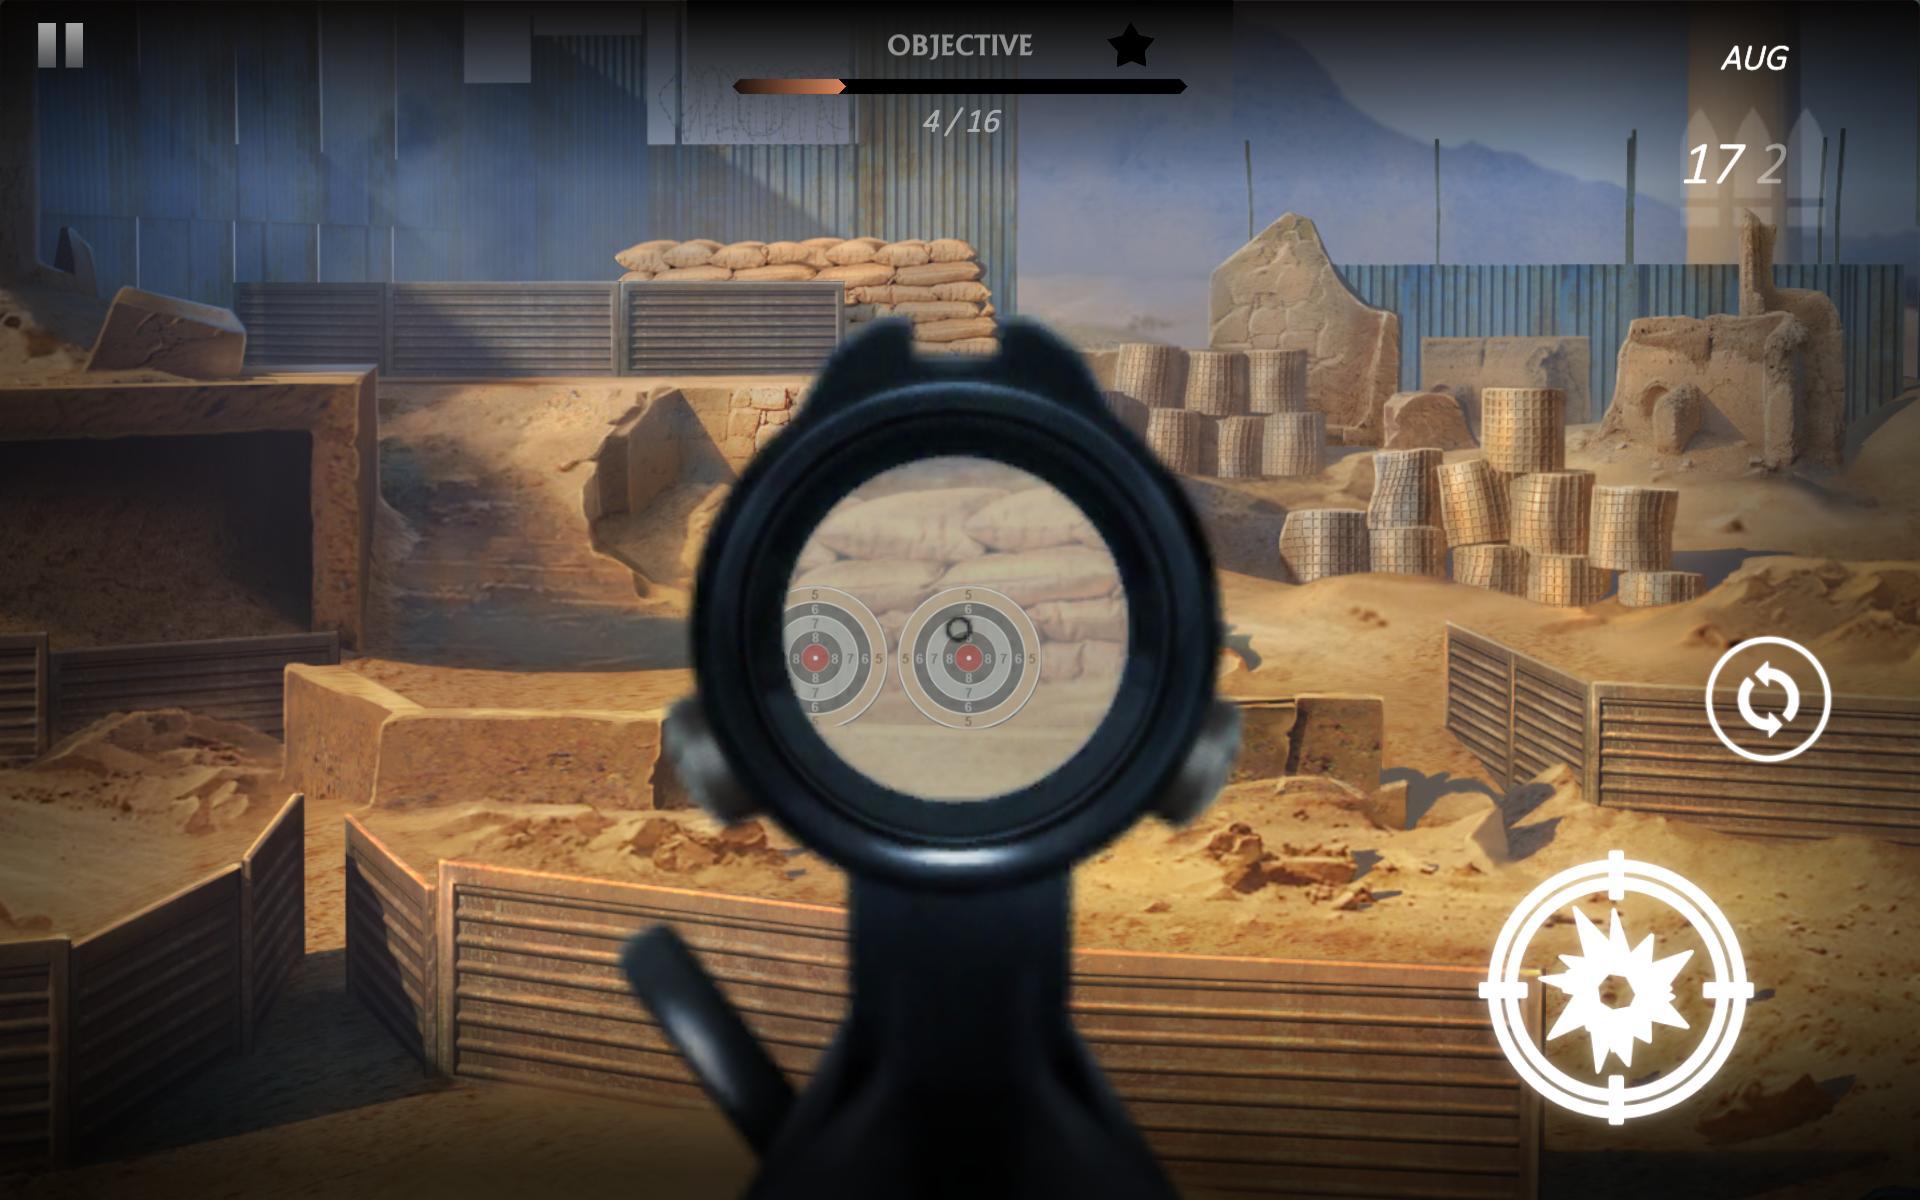 Canyon Shooting 2 - Free Shooting Range 3.0.6 Screenshot 14